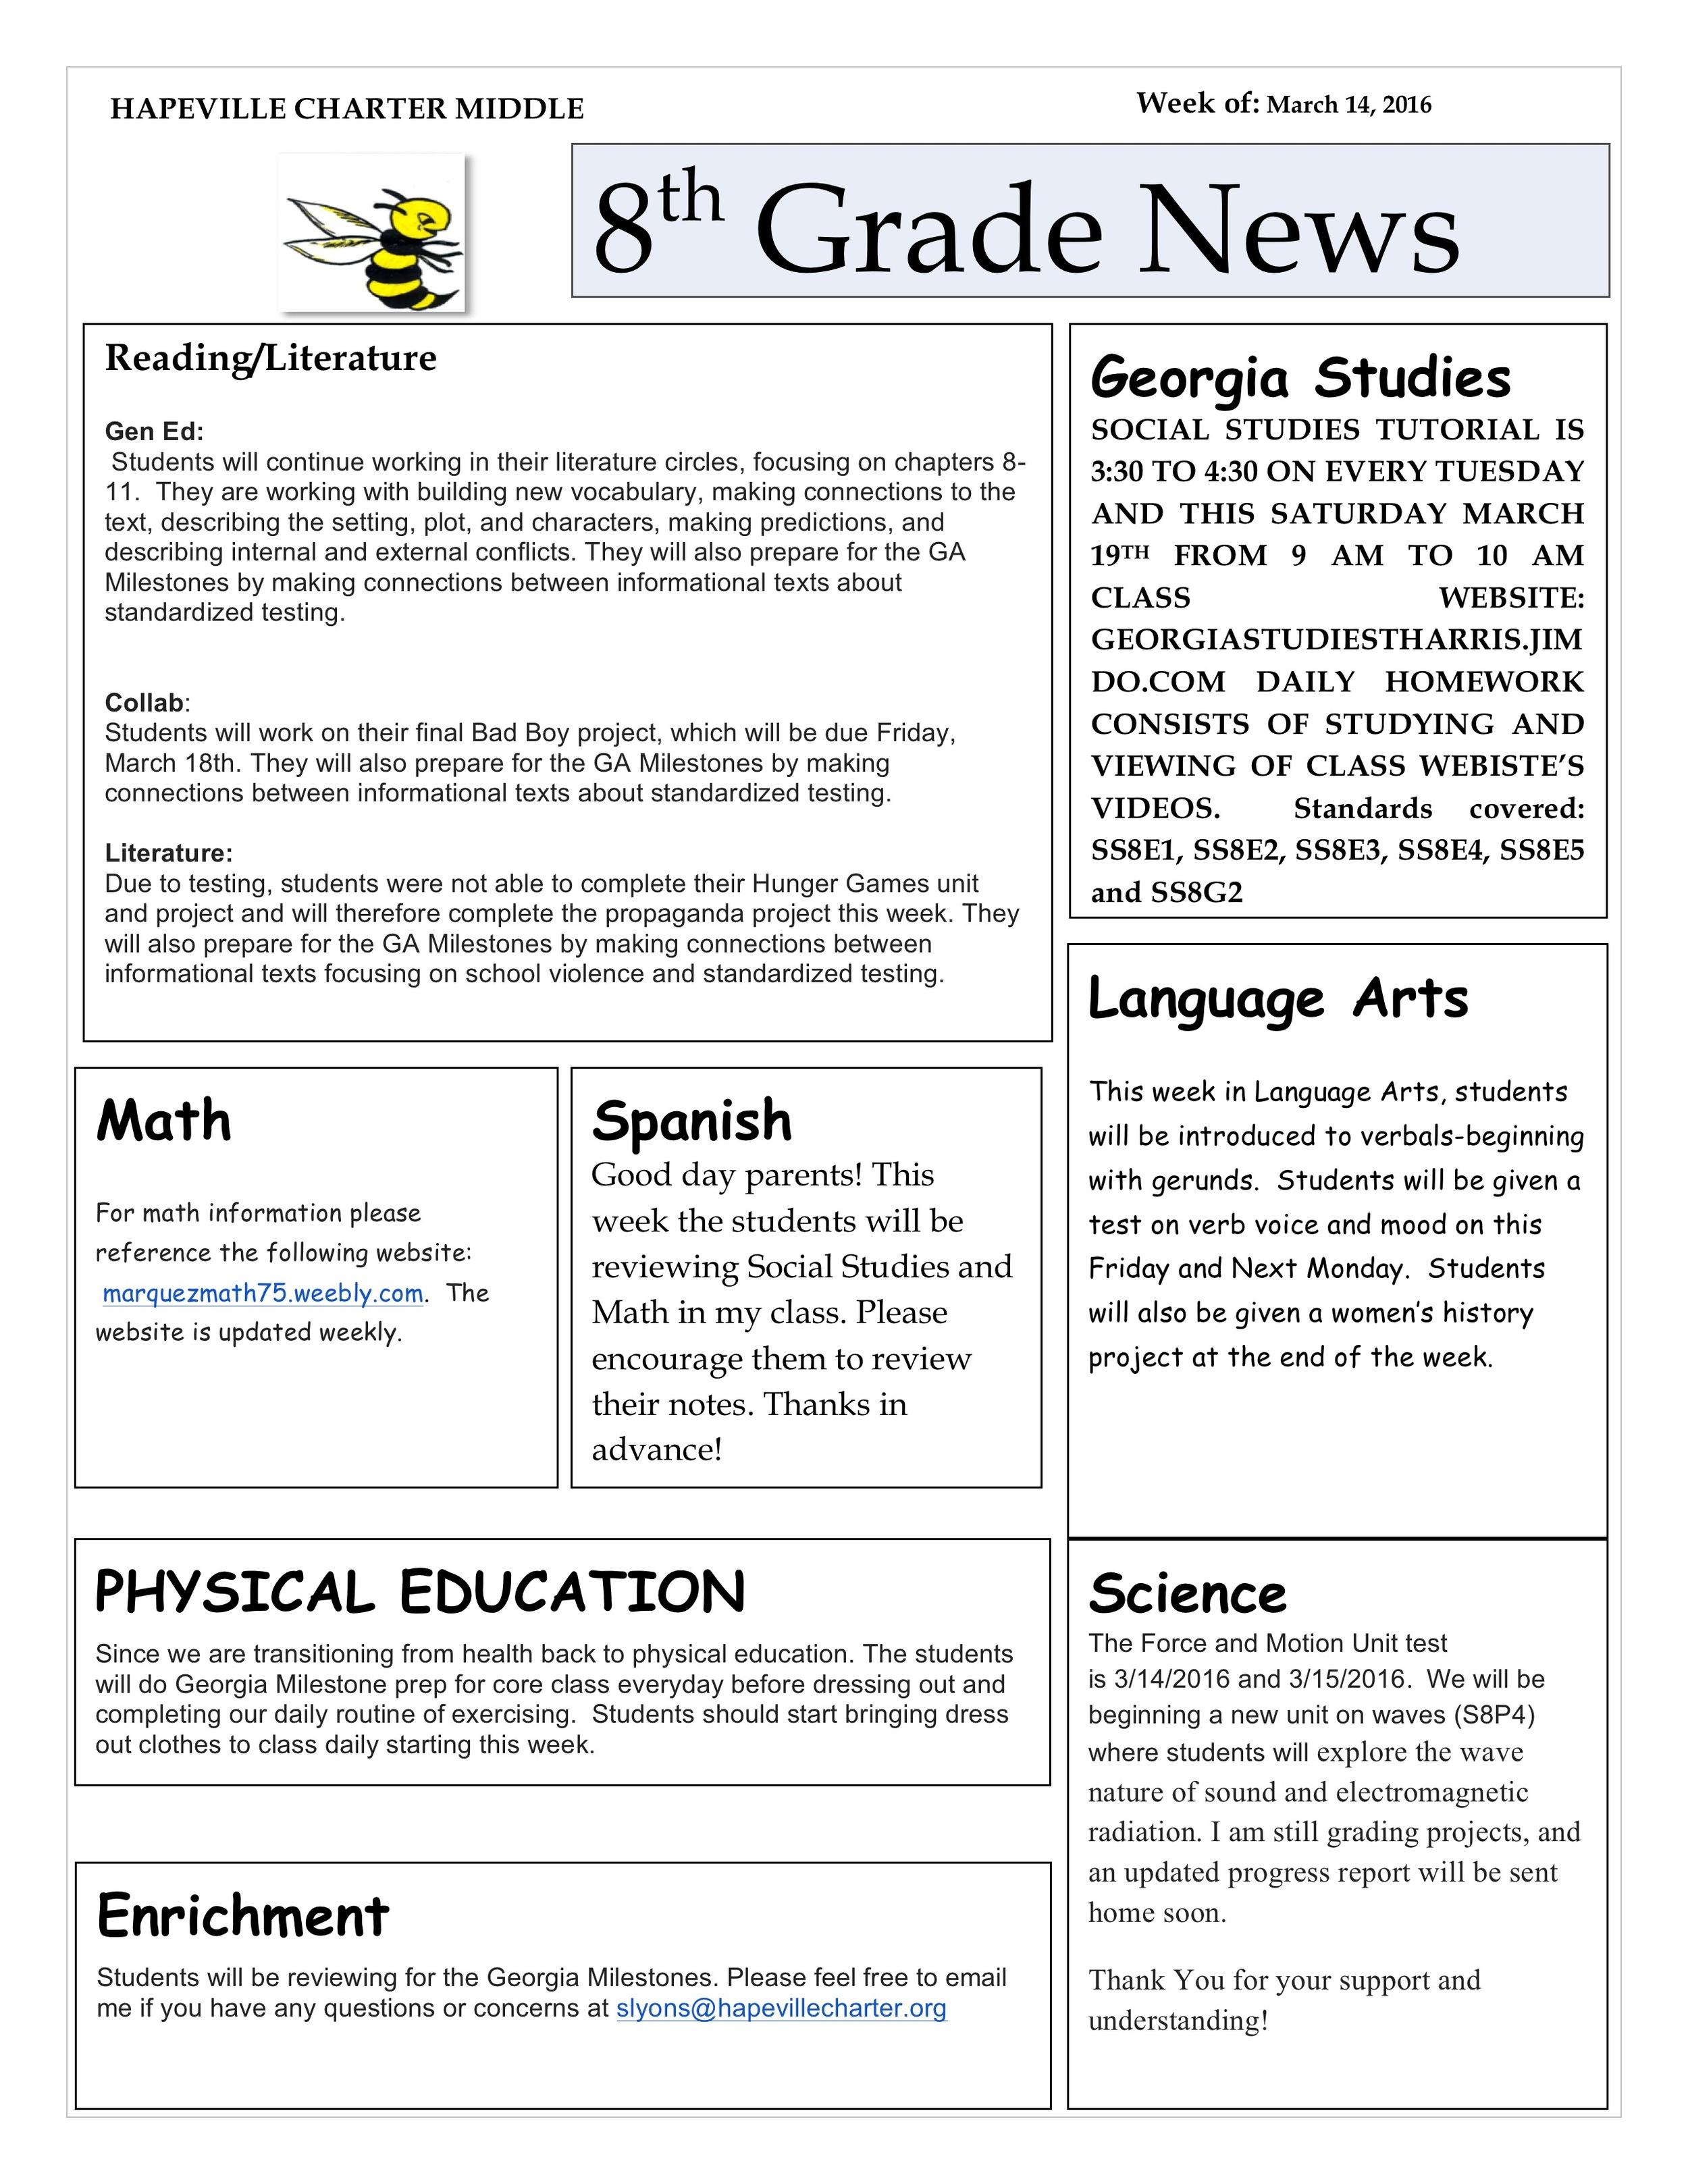 Newsletter Image8th grade 3-14.jpeg